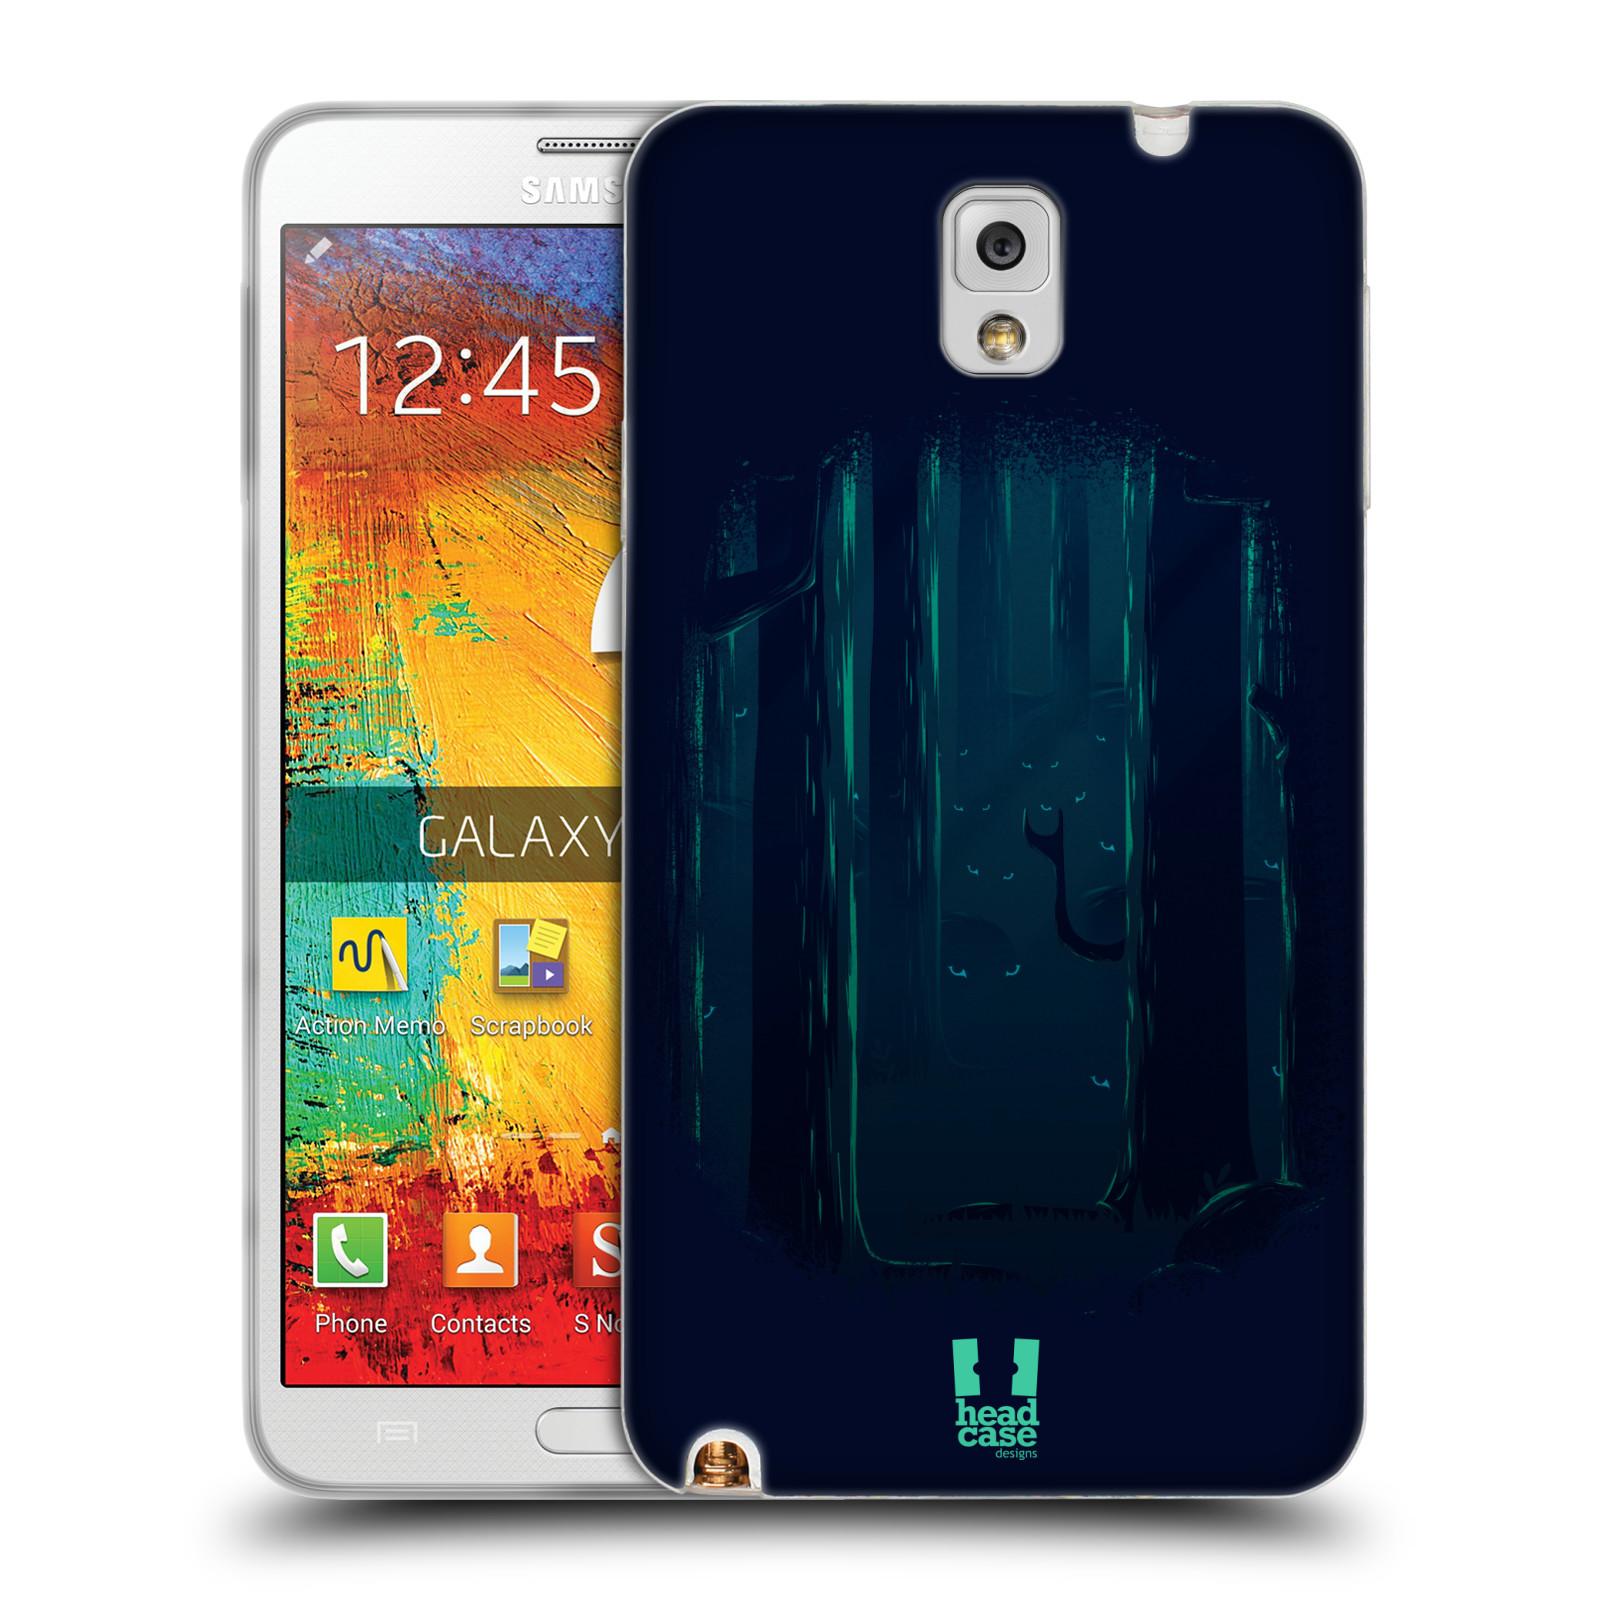 HEAD-CASE-DESIGNS-ENCHANTING-GROVE-SOFT-GEL-CASE-FOR-SAMSUNG-PHONES-2